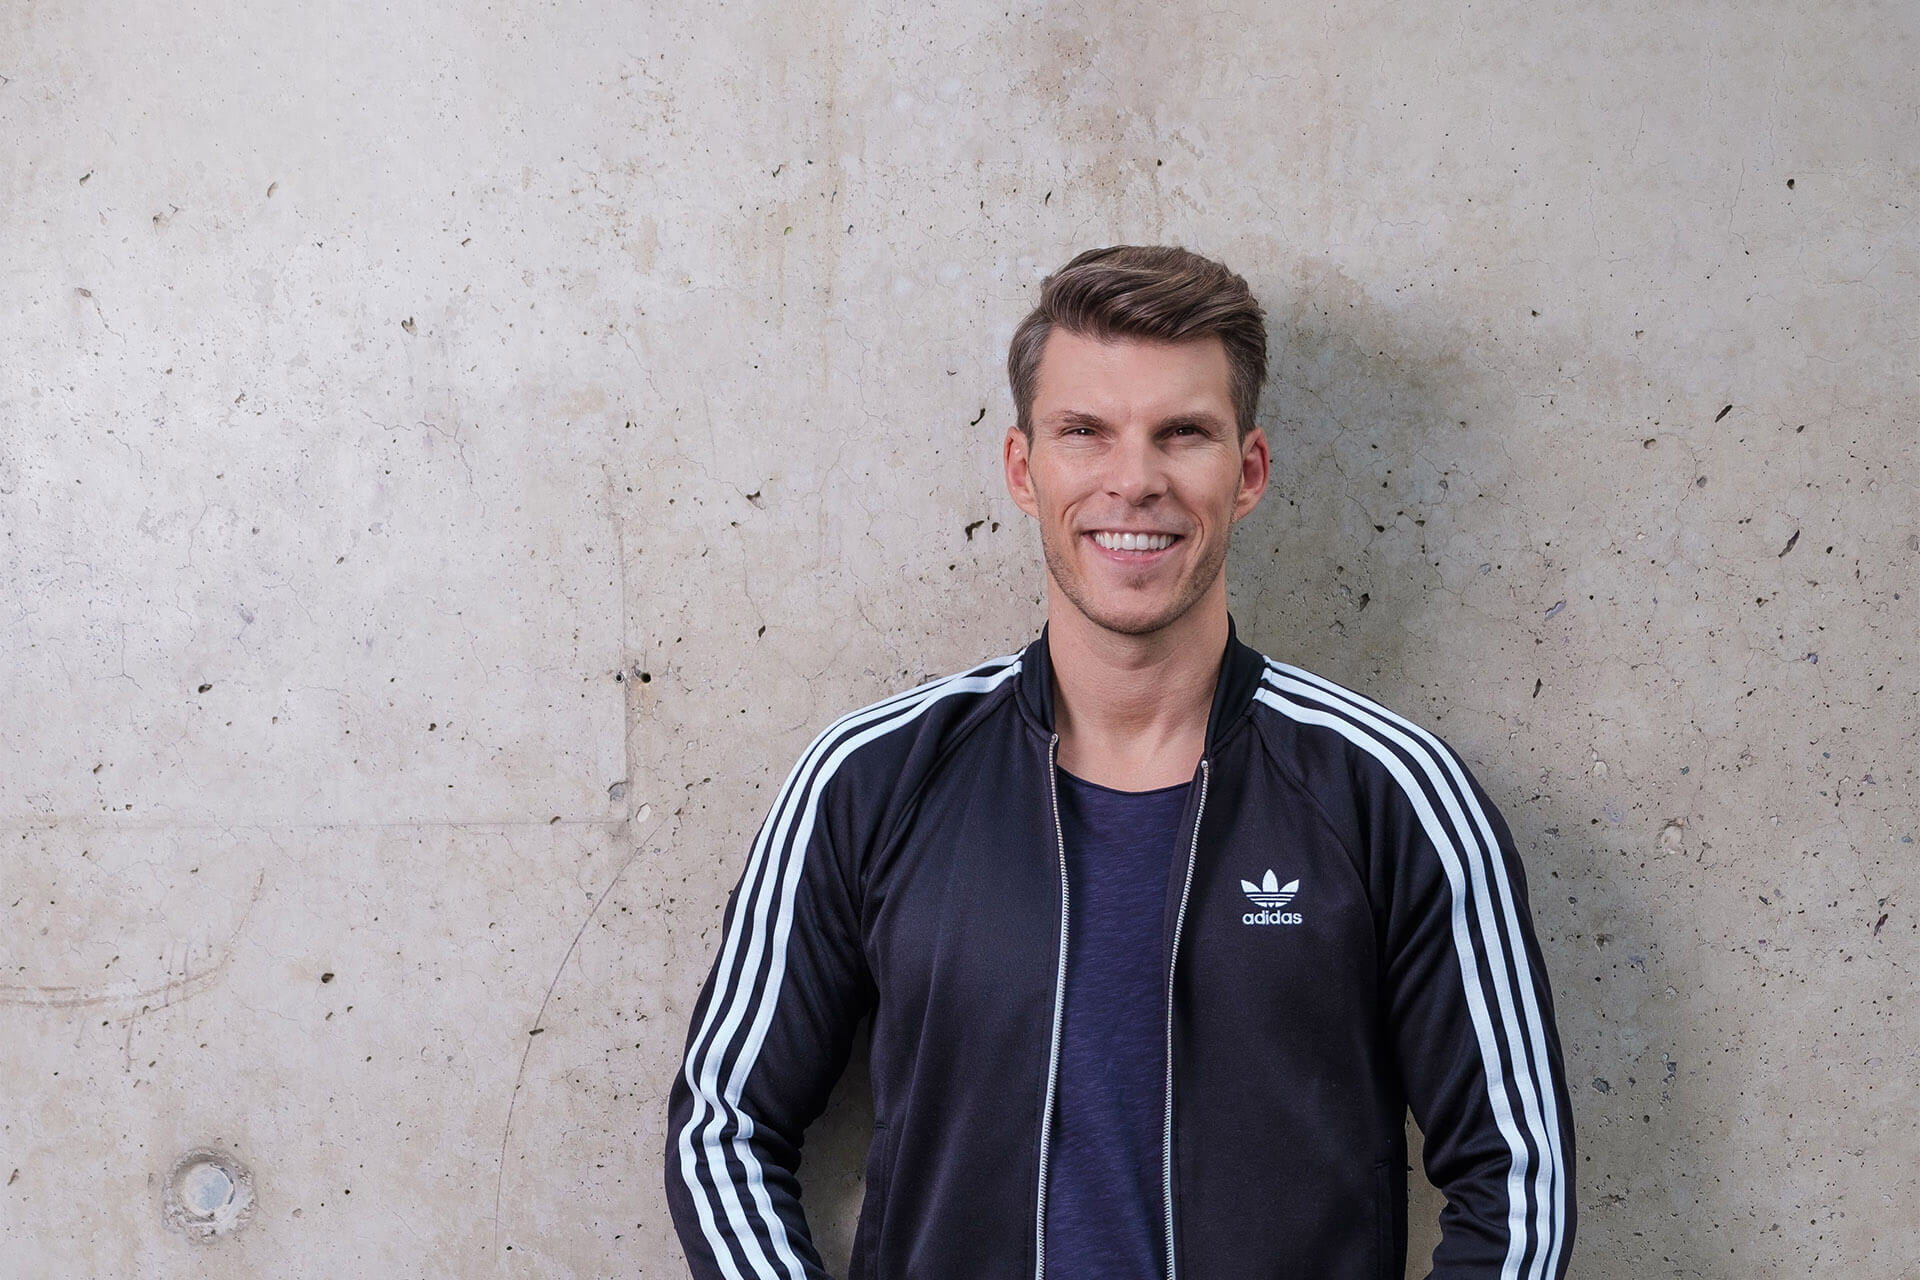 Runtastic Gründer Florian Gschwandtner steigt aktiv bei Tractive ein